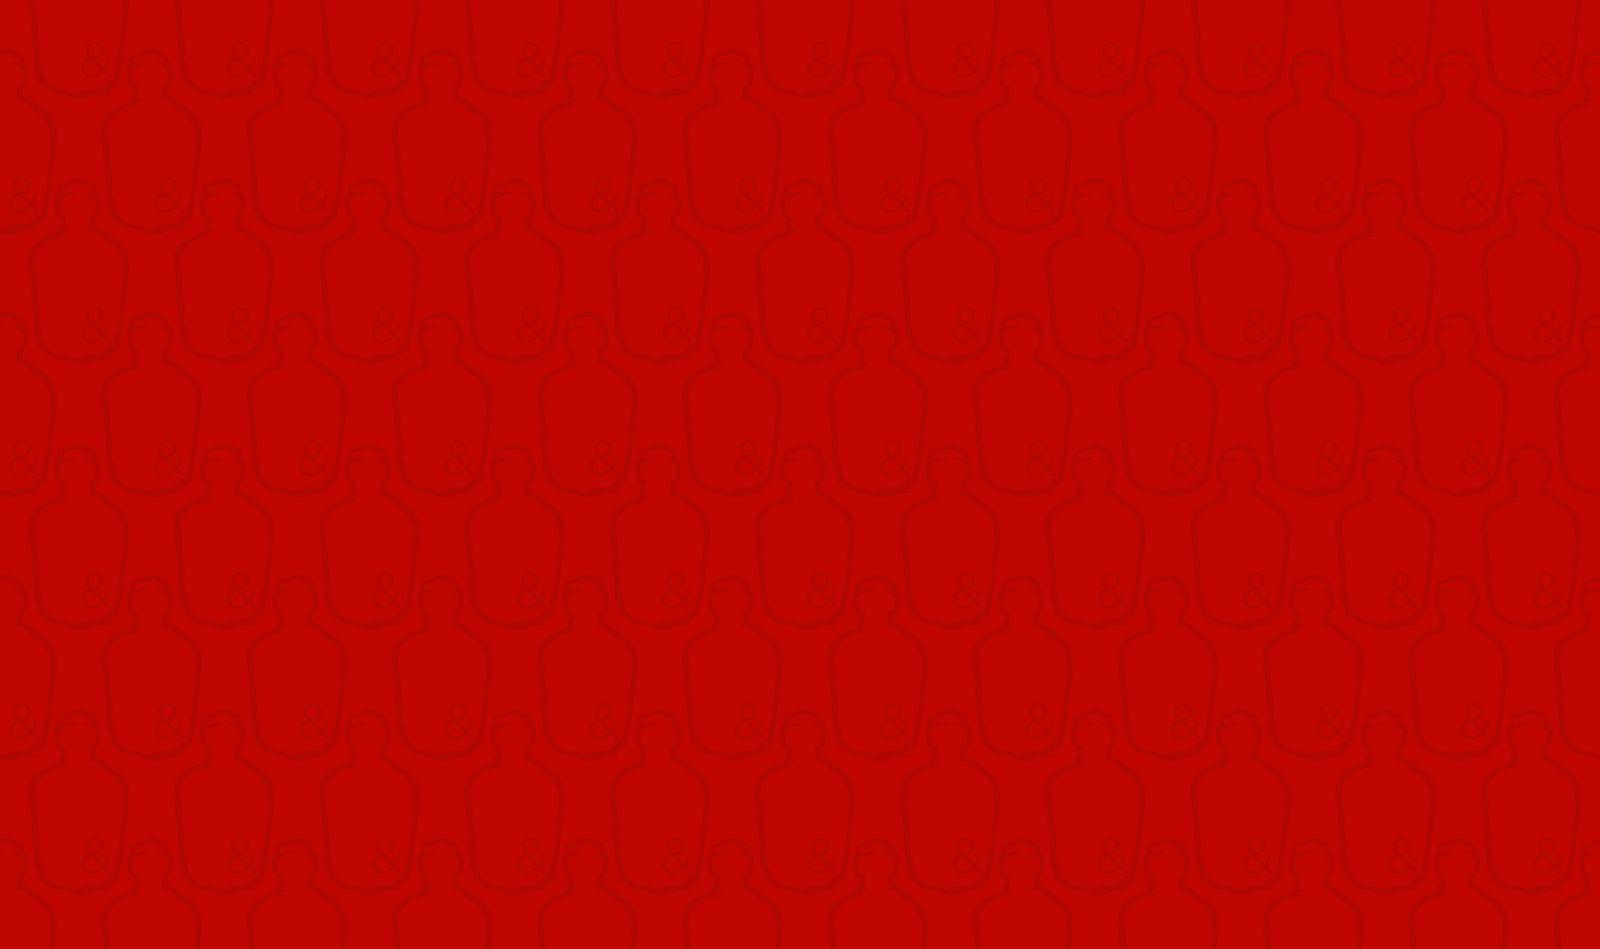 Colm O Connor, Colm O'Connor, Colm O Connor graphic design, Colm O'Connor graphic designer, Freelance graphic designer living in Wexford Ireland, colmoconnor, graphic design, graphic designer, graphic design wexford, freelance graphic design, freelance graphic designer, web design, web designer, graphic design waterford, graphic design cork, wexford, Ireland, illustrator, Waterford, graphic design graduate, portfolio, brand identity, print, logo, logotype, logo mark, visual identity, branding, business card, logo design, typography, the sky and the ground branding, the sky and the ground logo, pub branding, pub logo, the sky and the ground wexford